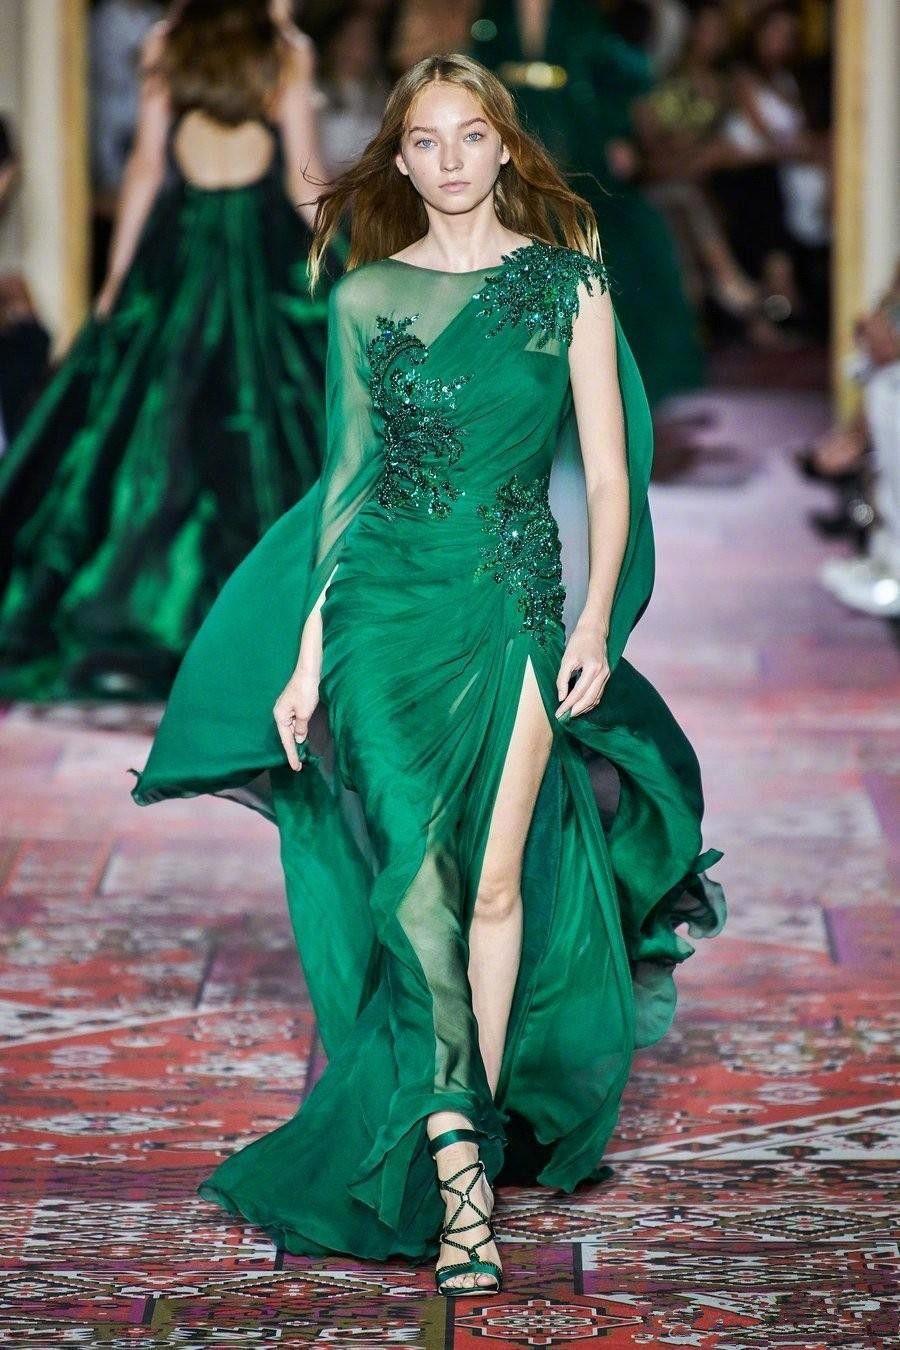 Vestidos Zuhair Murad Chiffon Vestidos longos 2020 verde escuro High Side Slit Pageant festa formal Prom Dresses BC2738